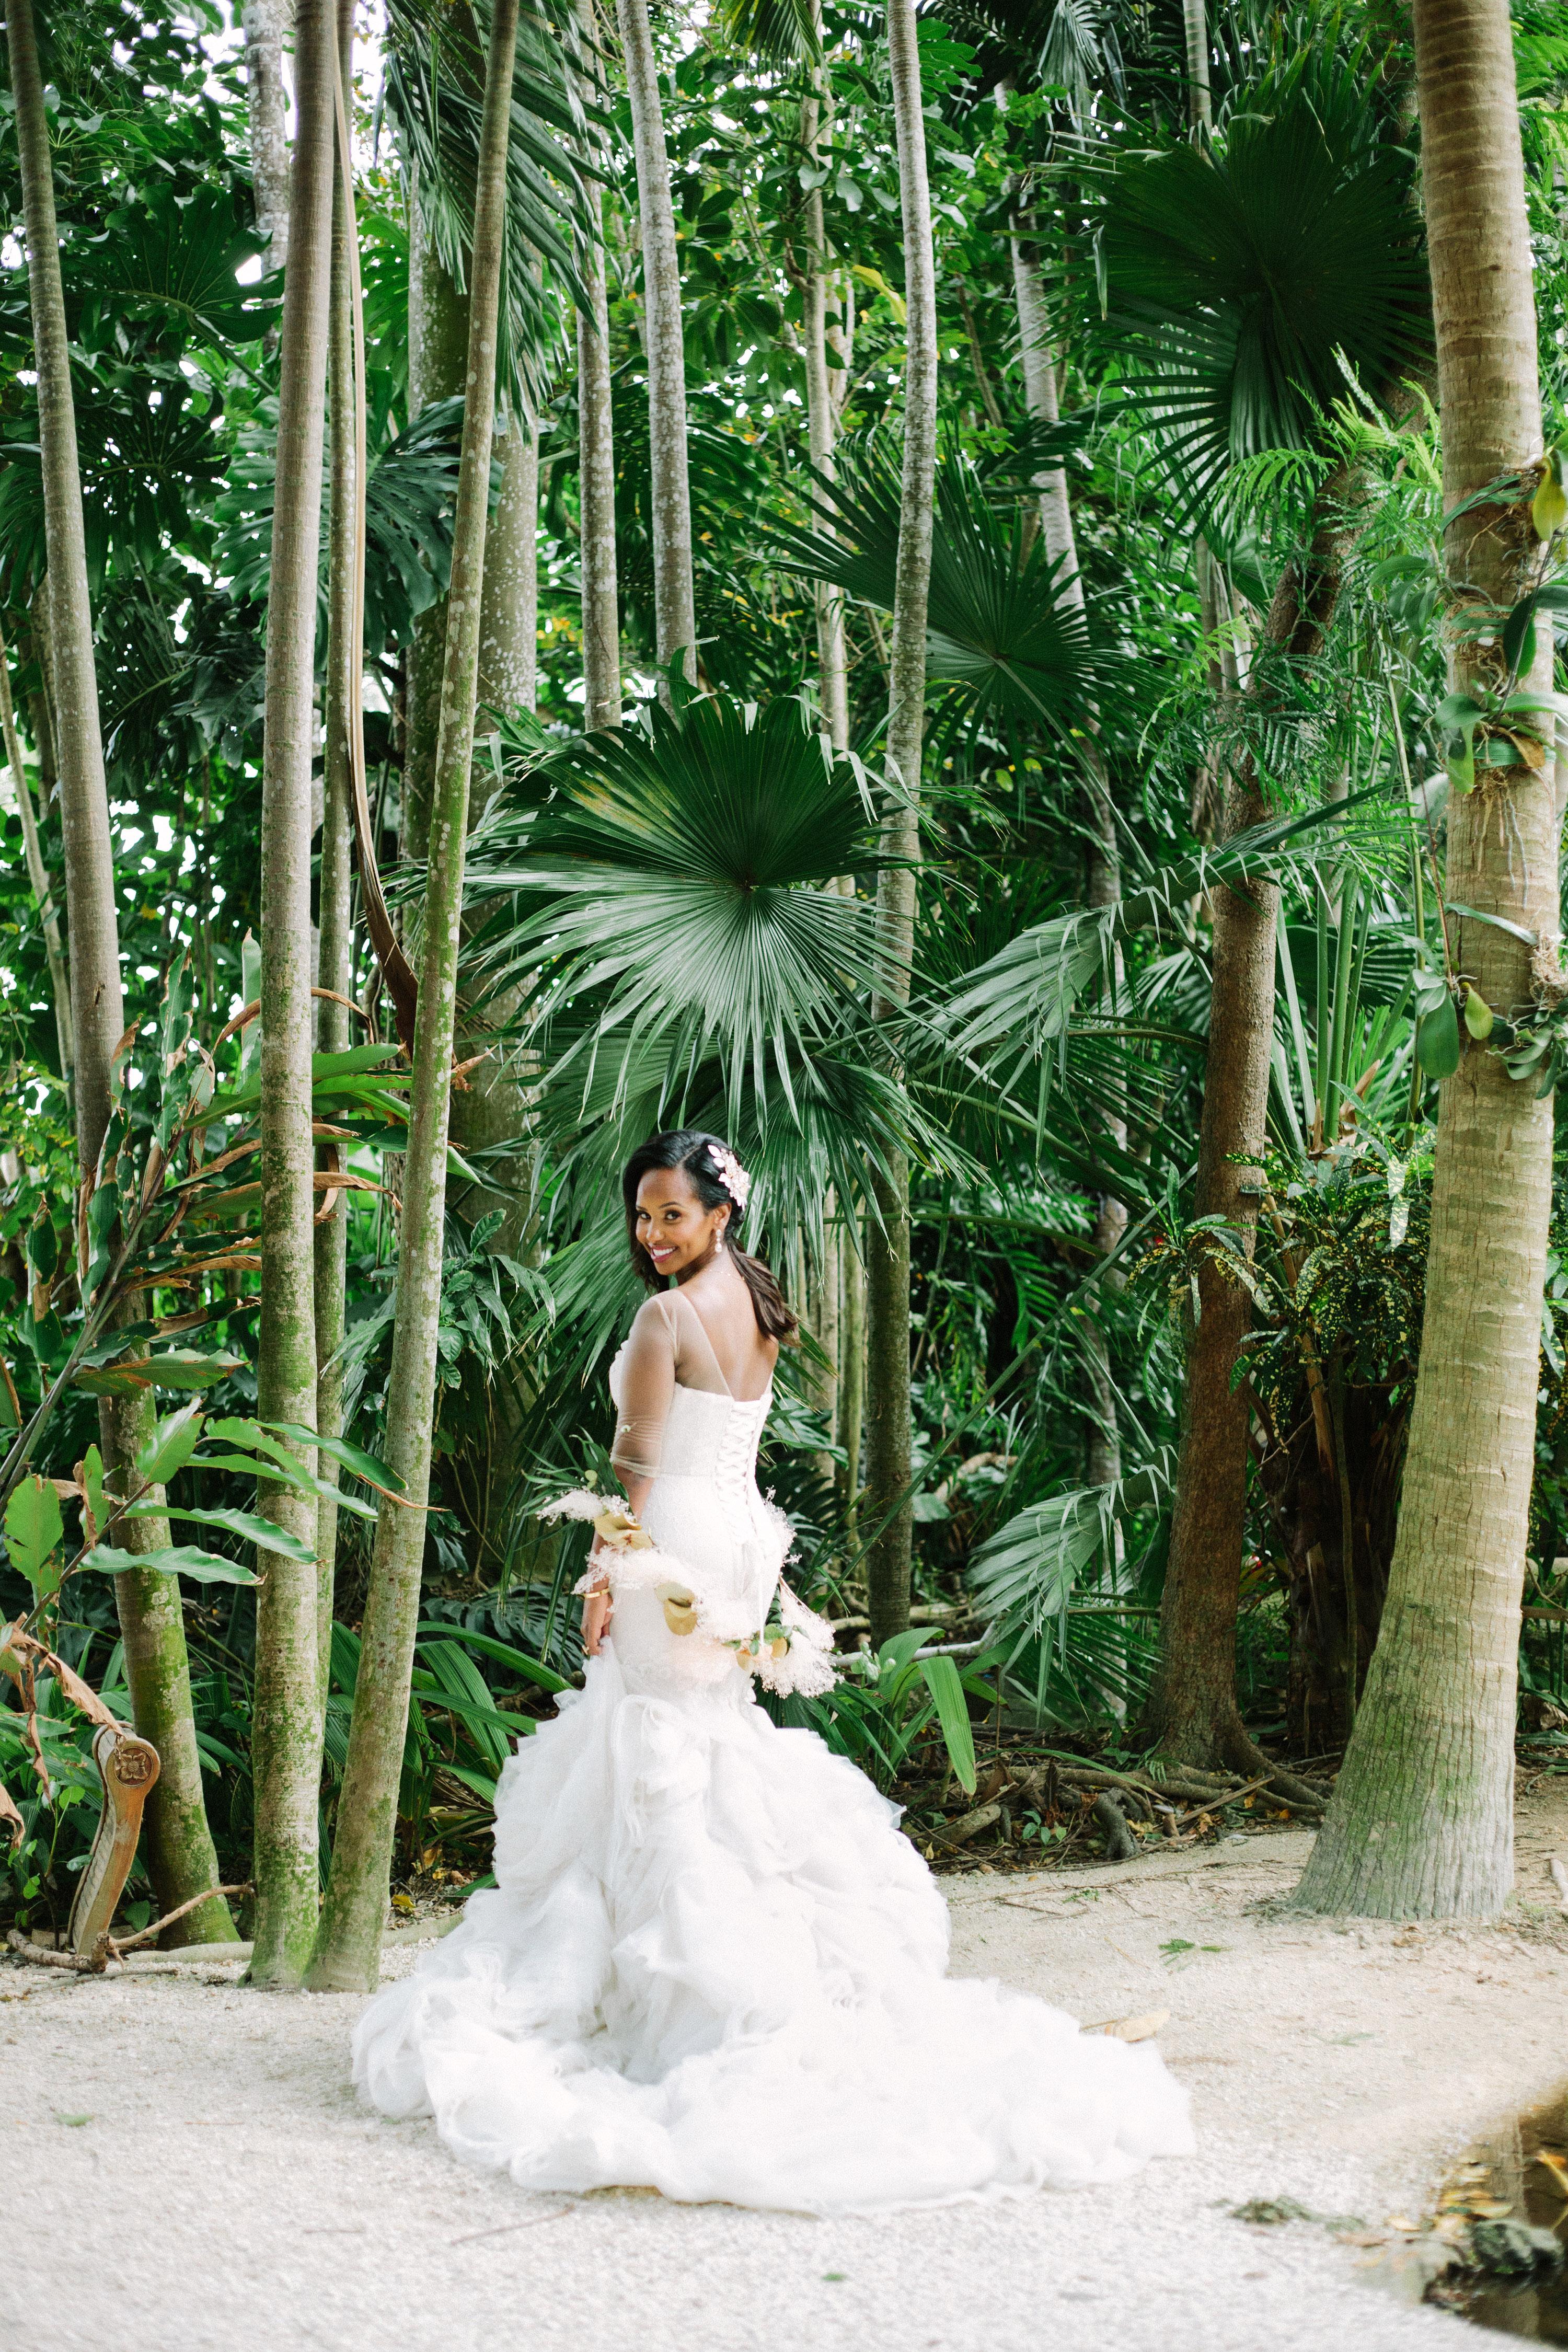 destination wedding dress in jungle setting